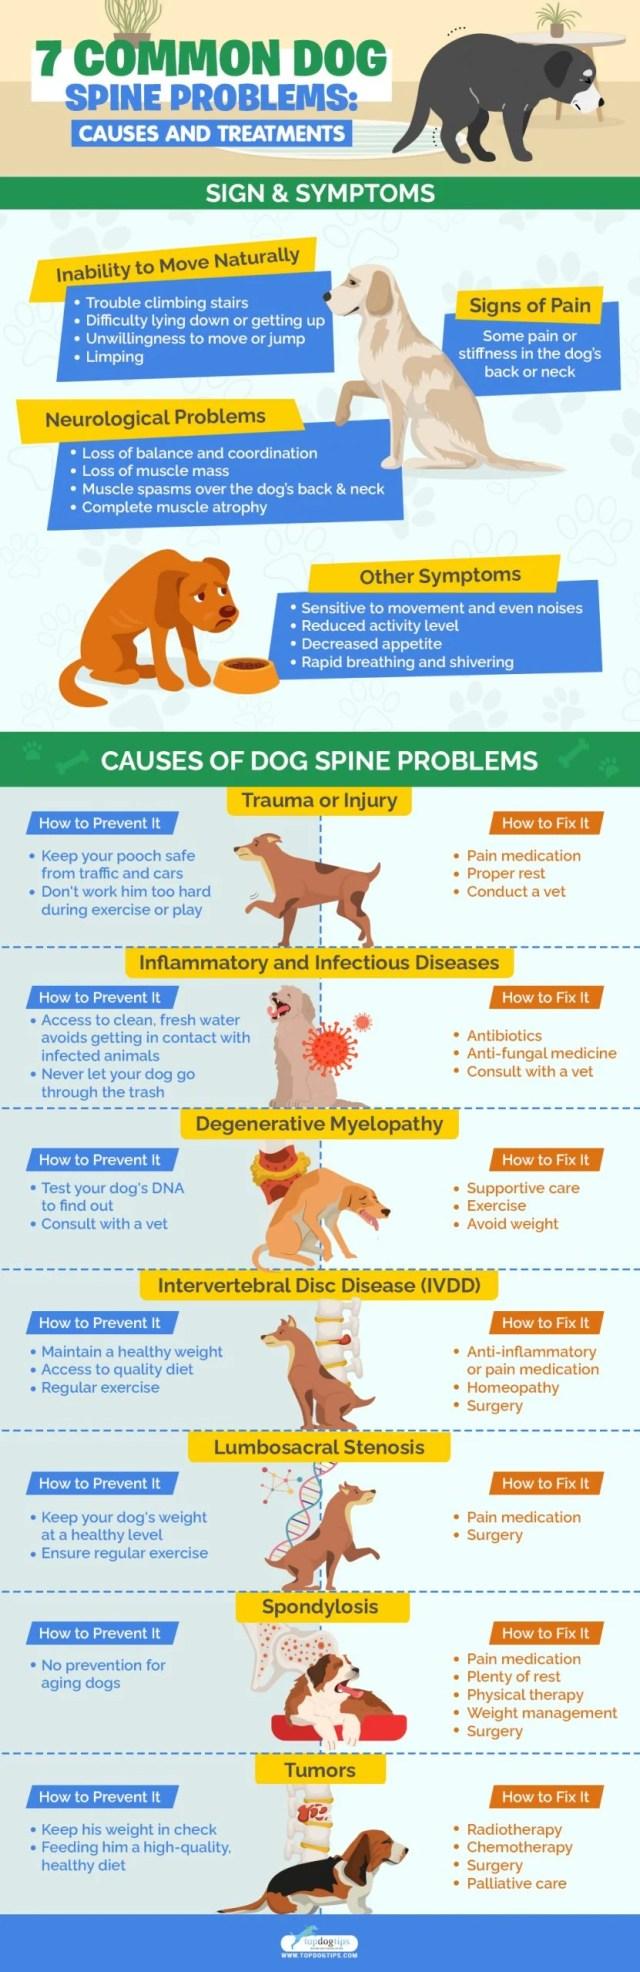 Dog Spine Problems